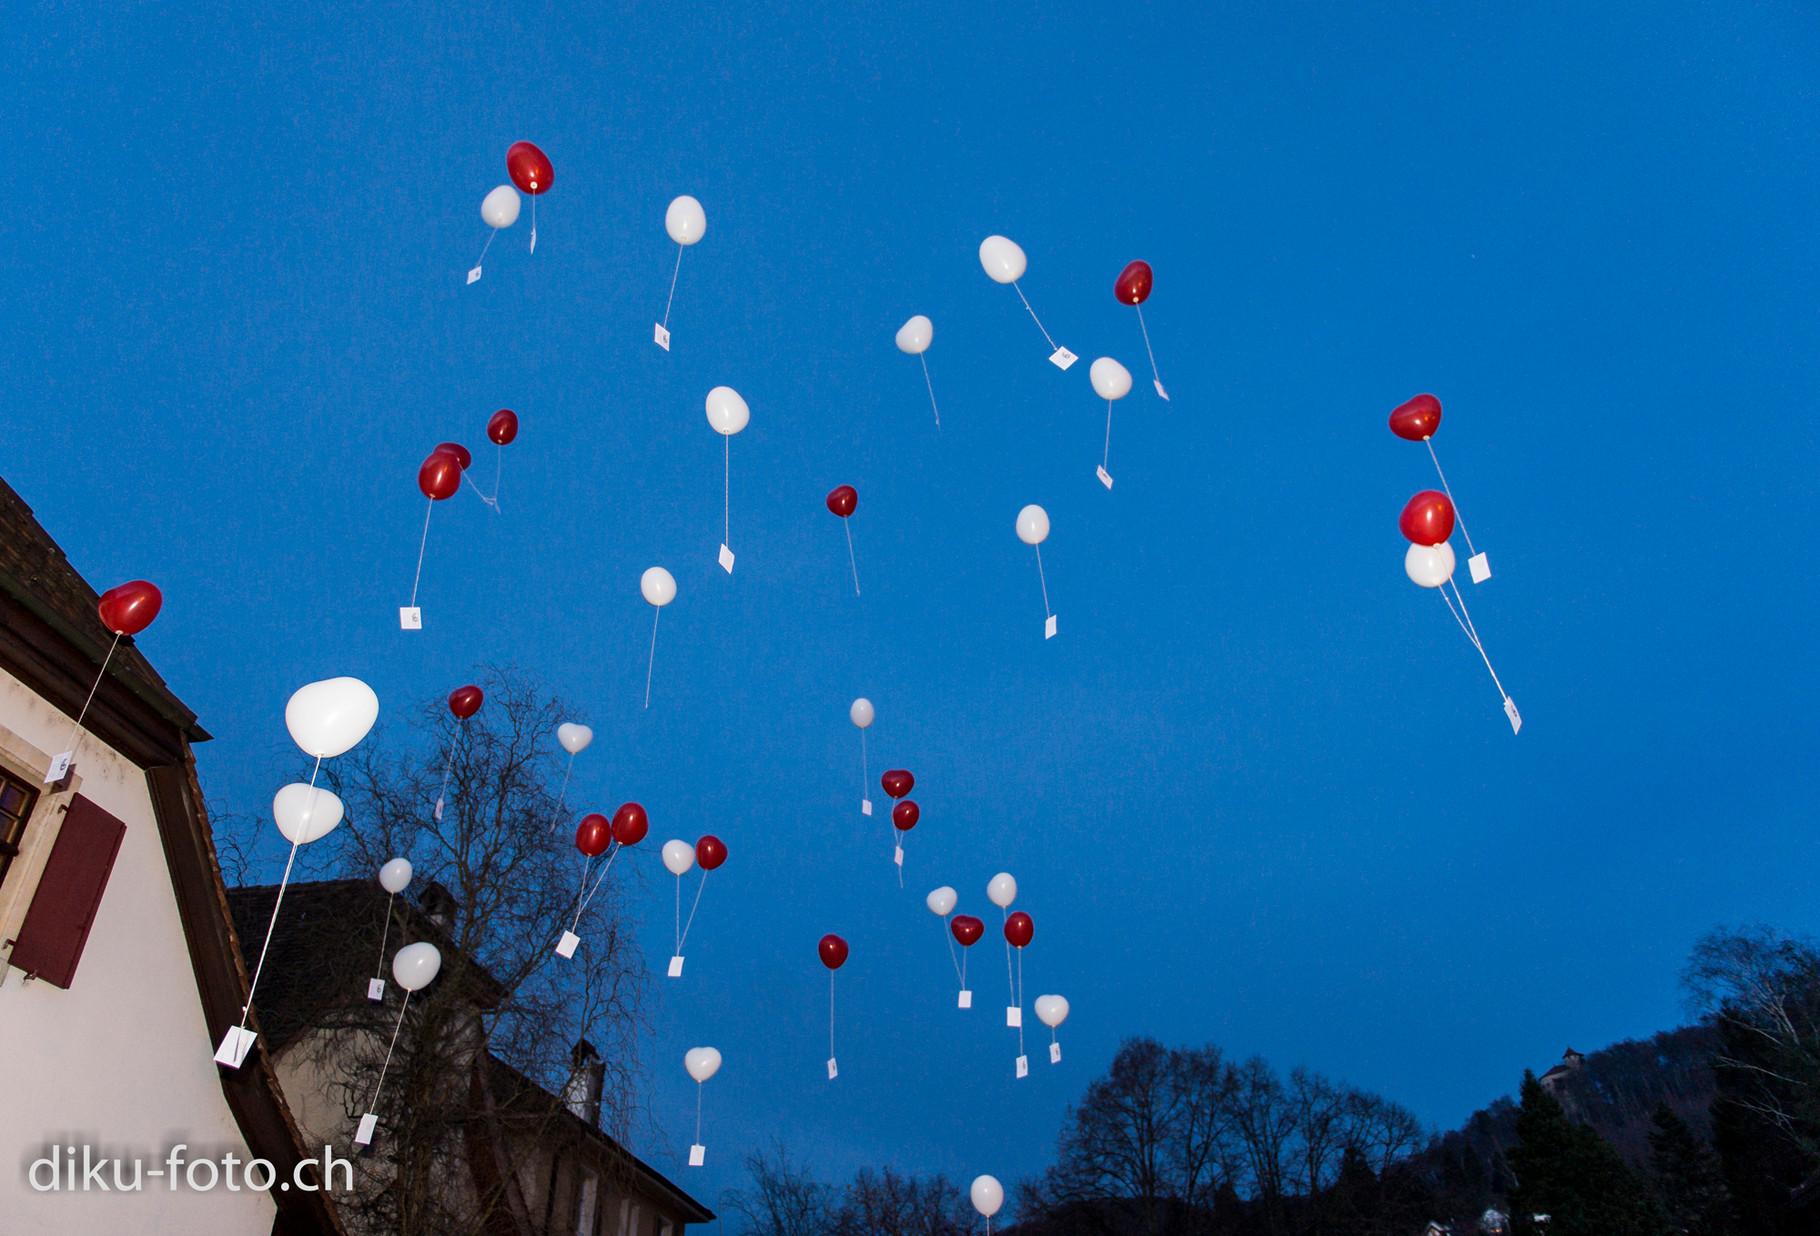 Ballone steigen in den Abendhimmel